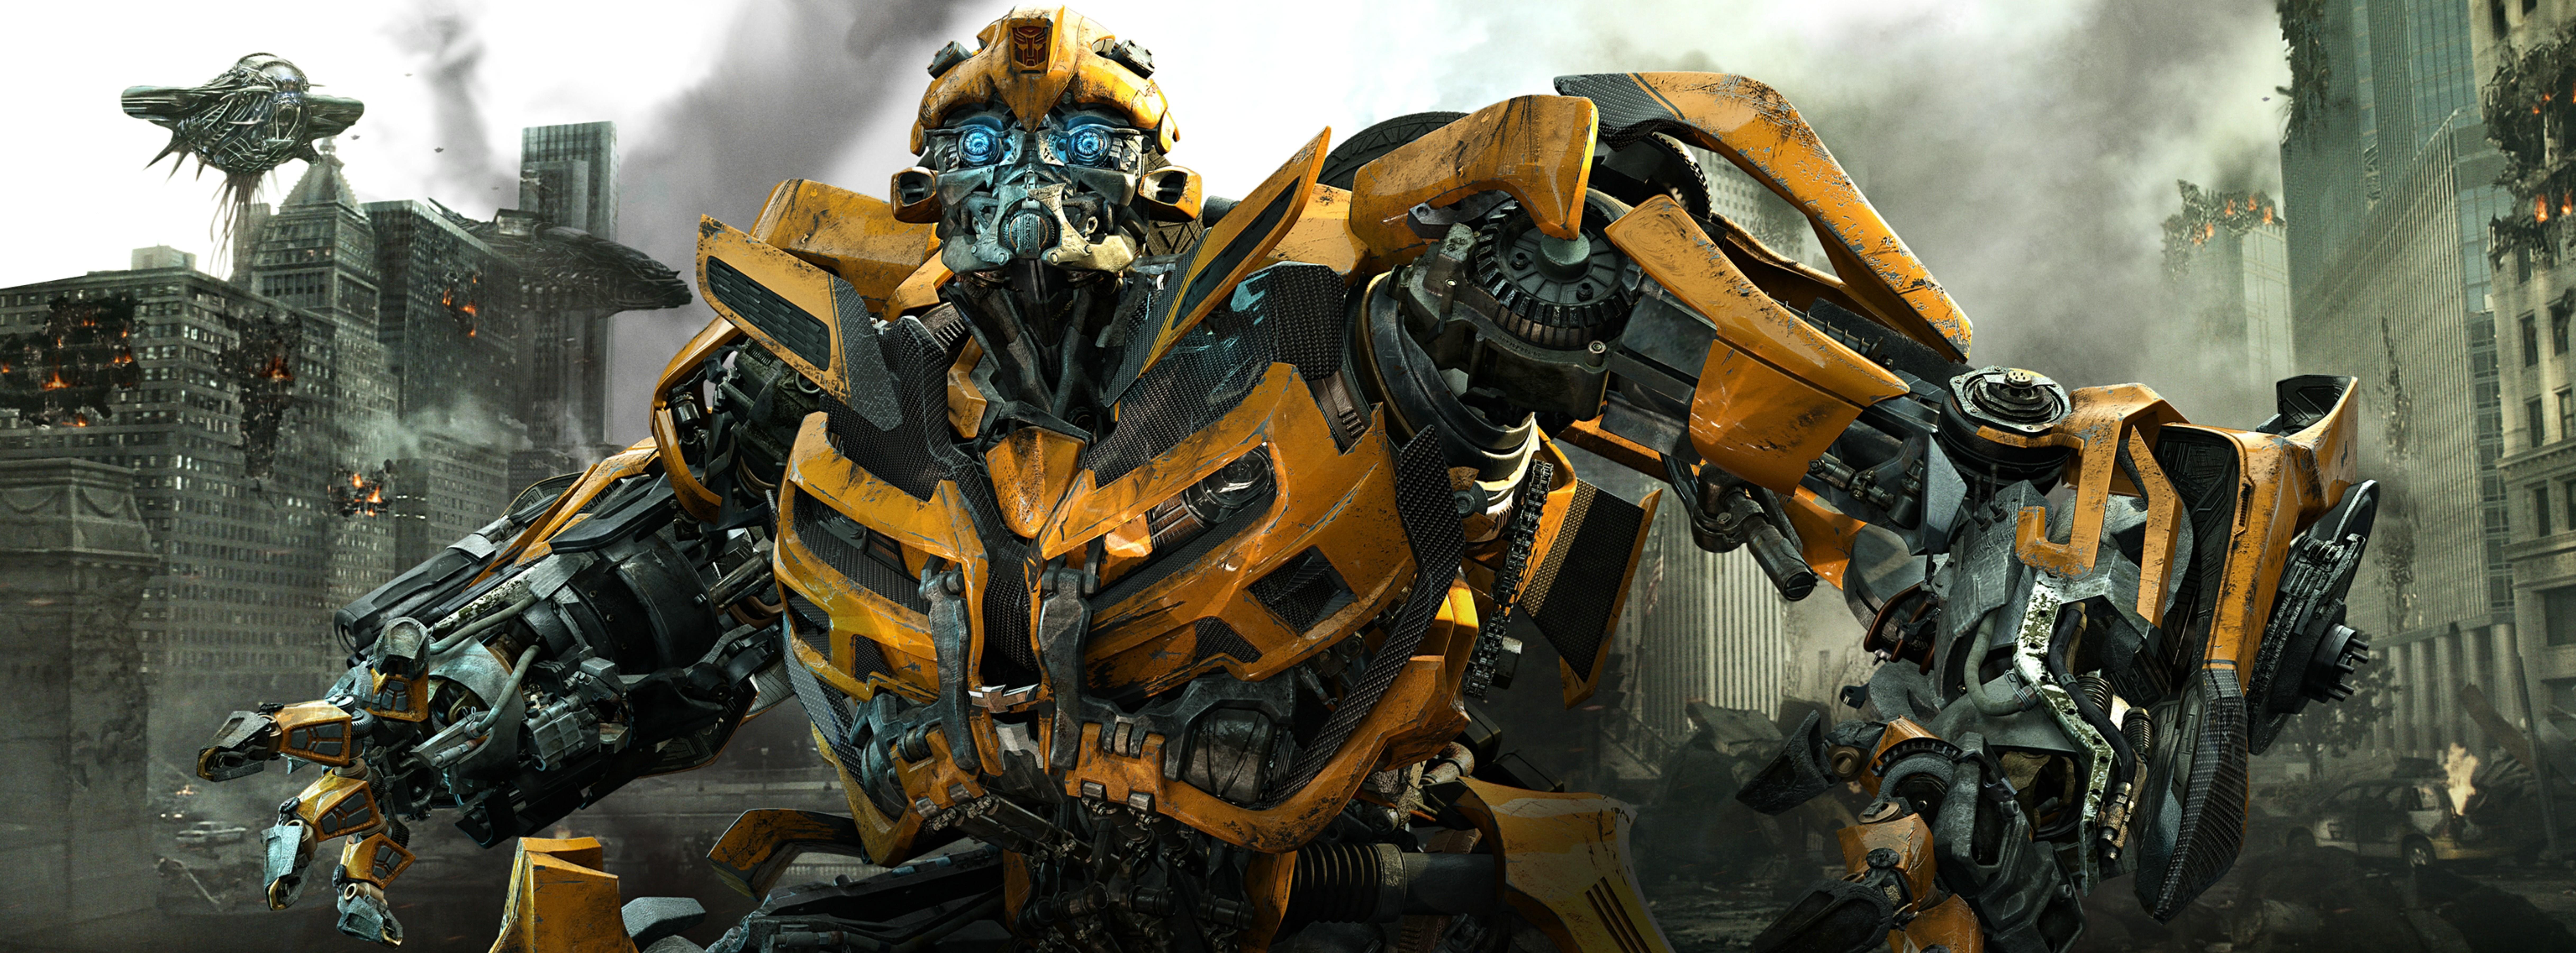 Download Film Transformers Dark Moon 2011